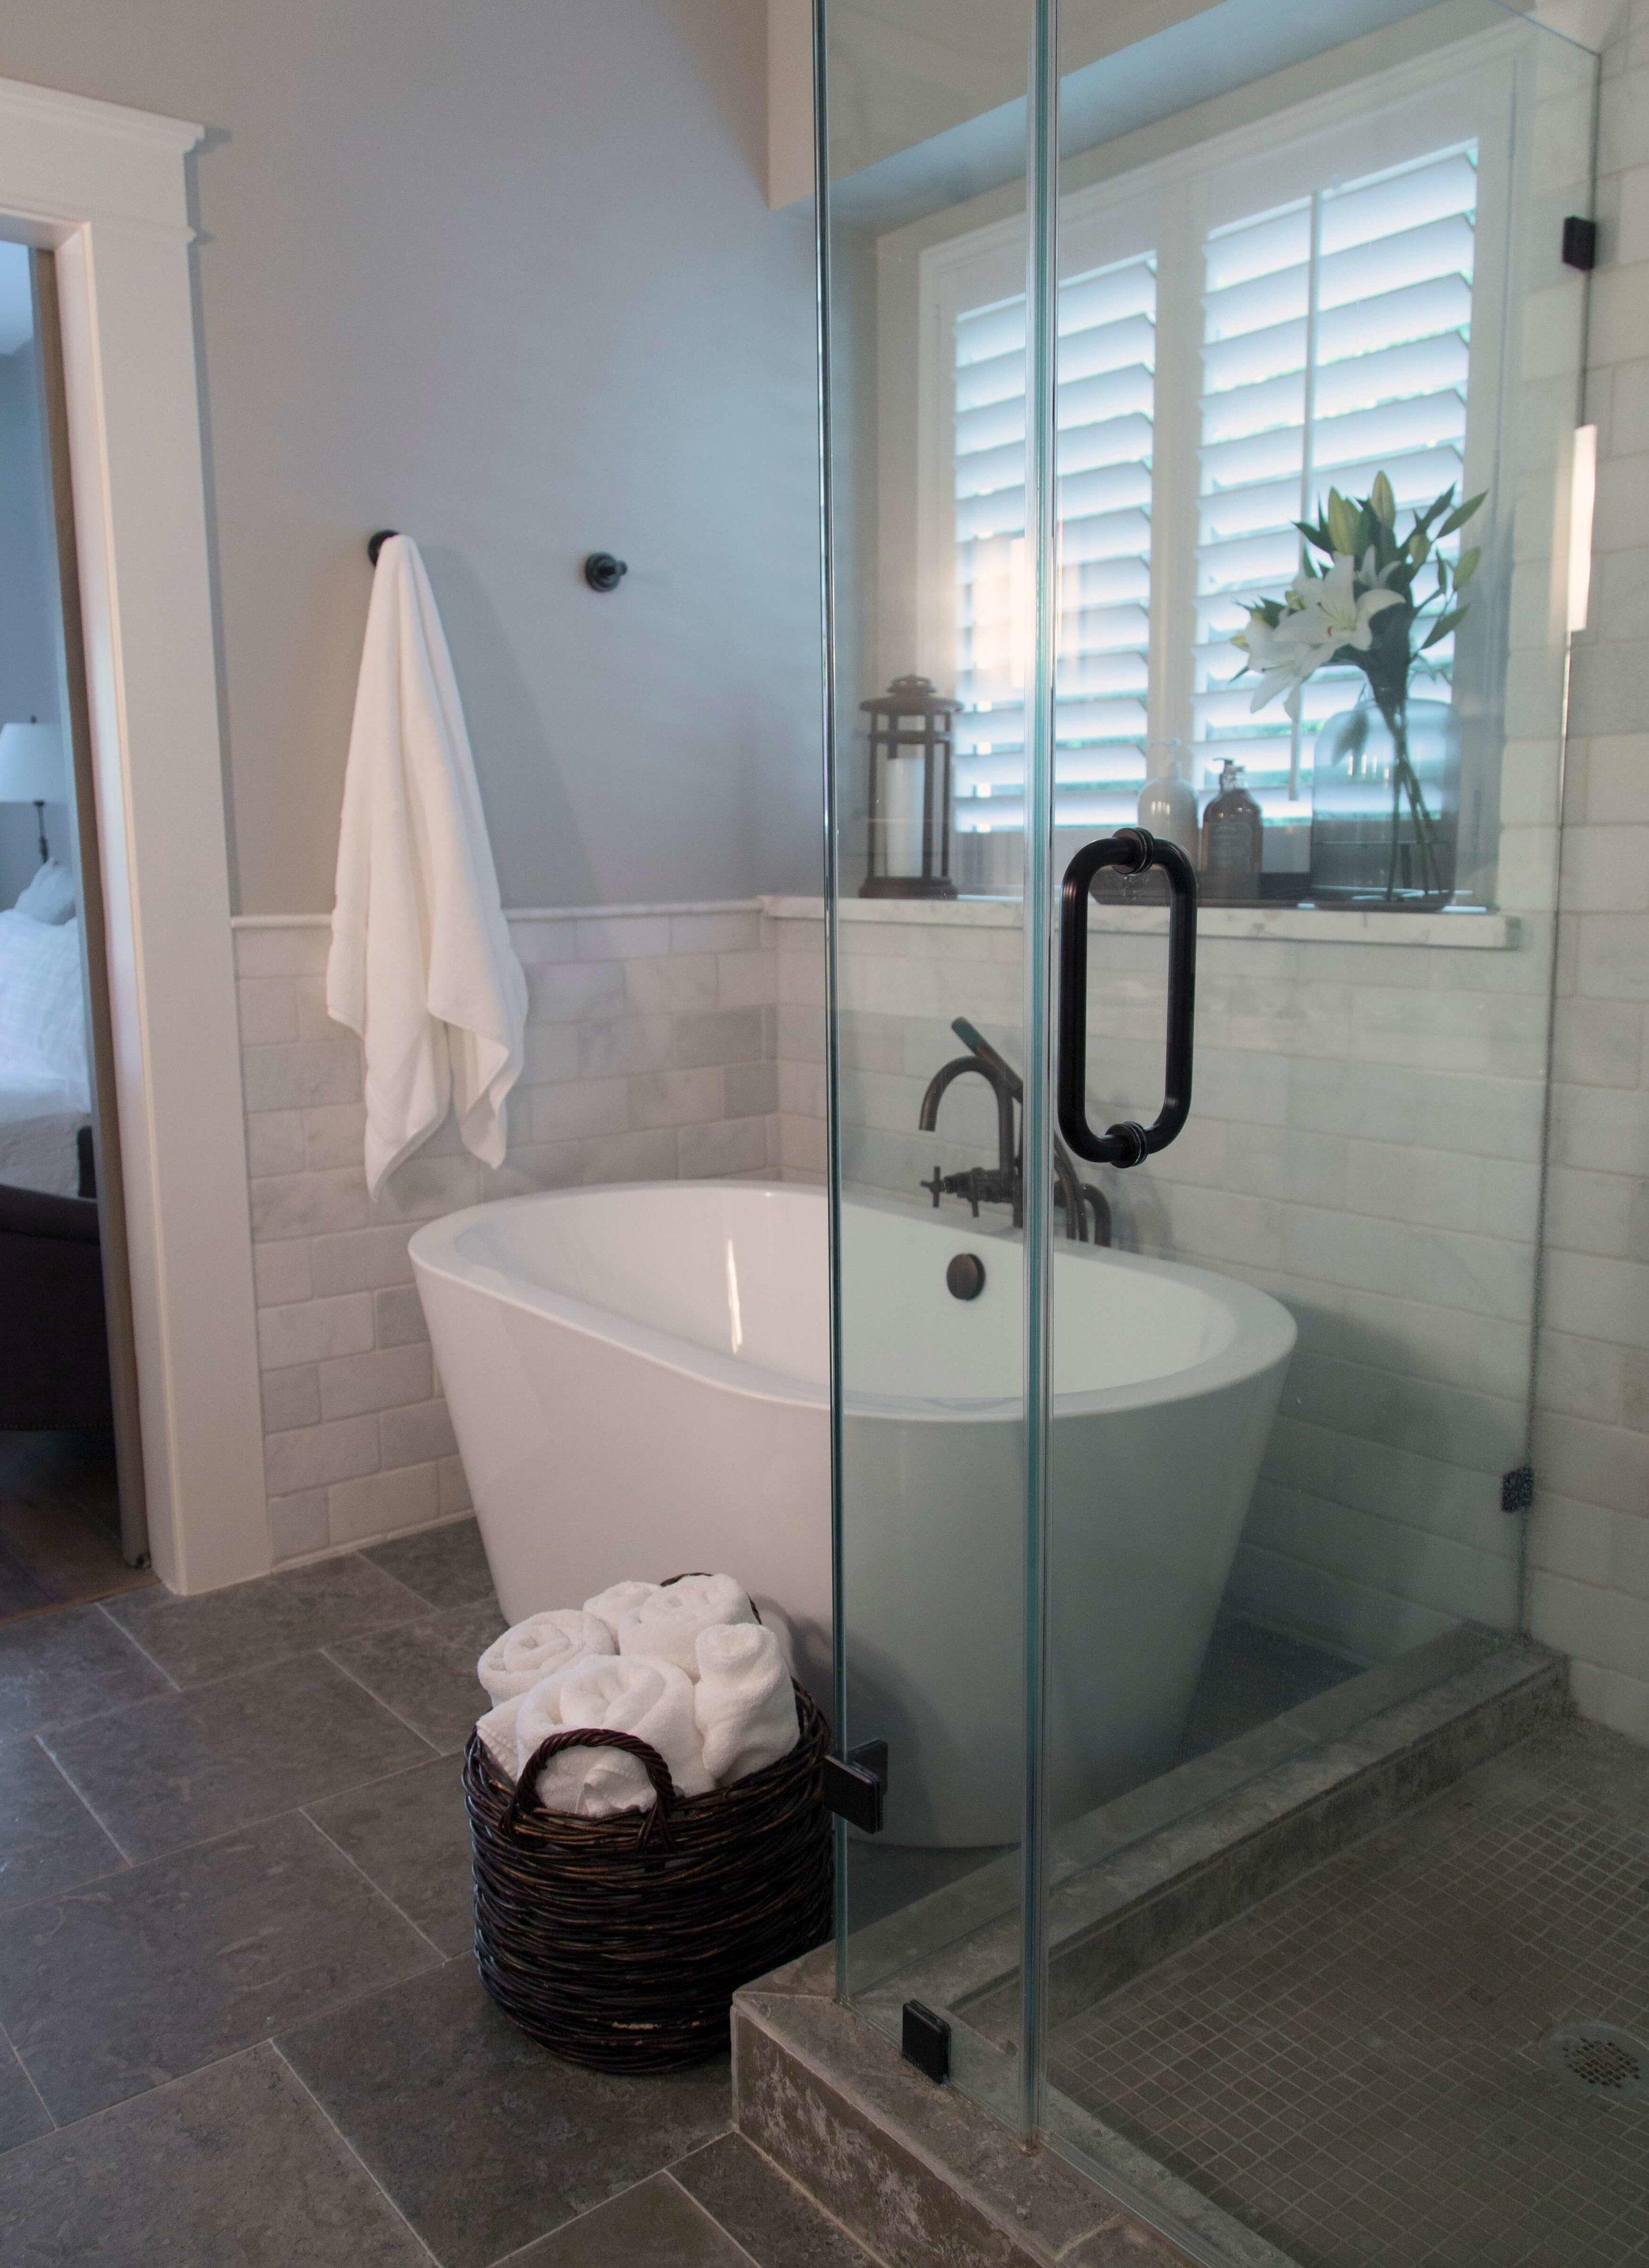 Bathroom shower curb in tile material that matches bathroom floor with frameless glass shower. Carla Aston, Designer | Tori Aston, Photographer #shower #showertile #bathroomdesign